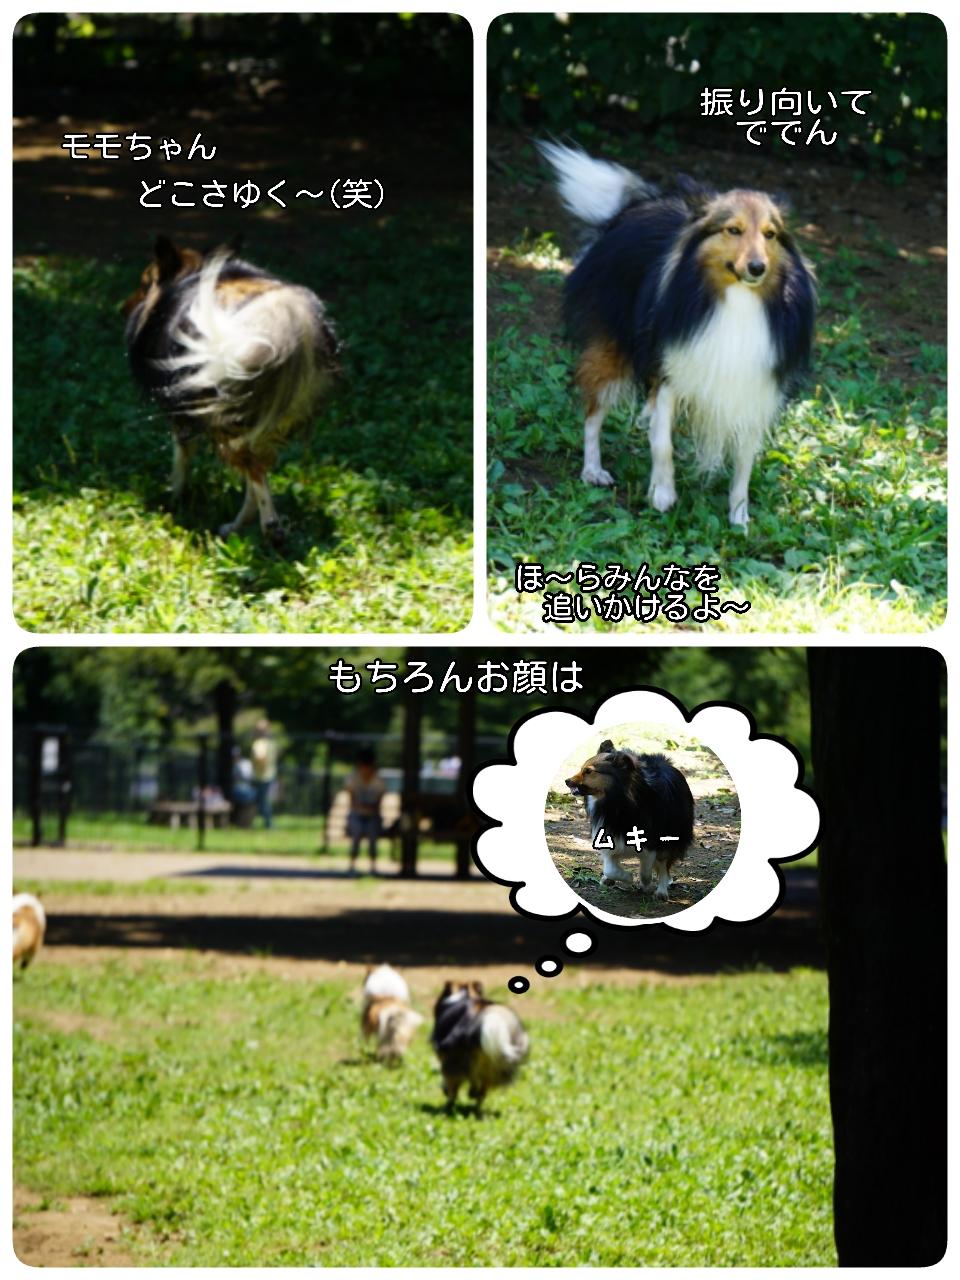 16-08-01-14-35-29-572_deco.jpg